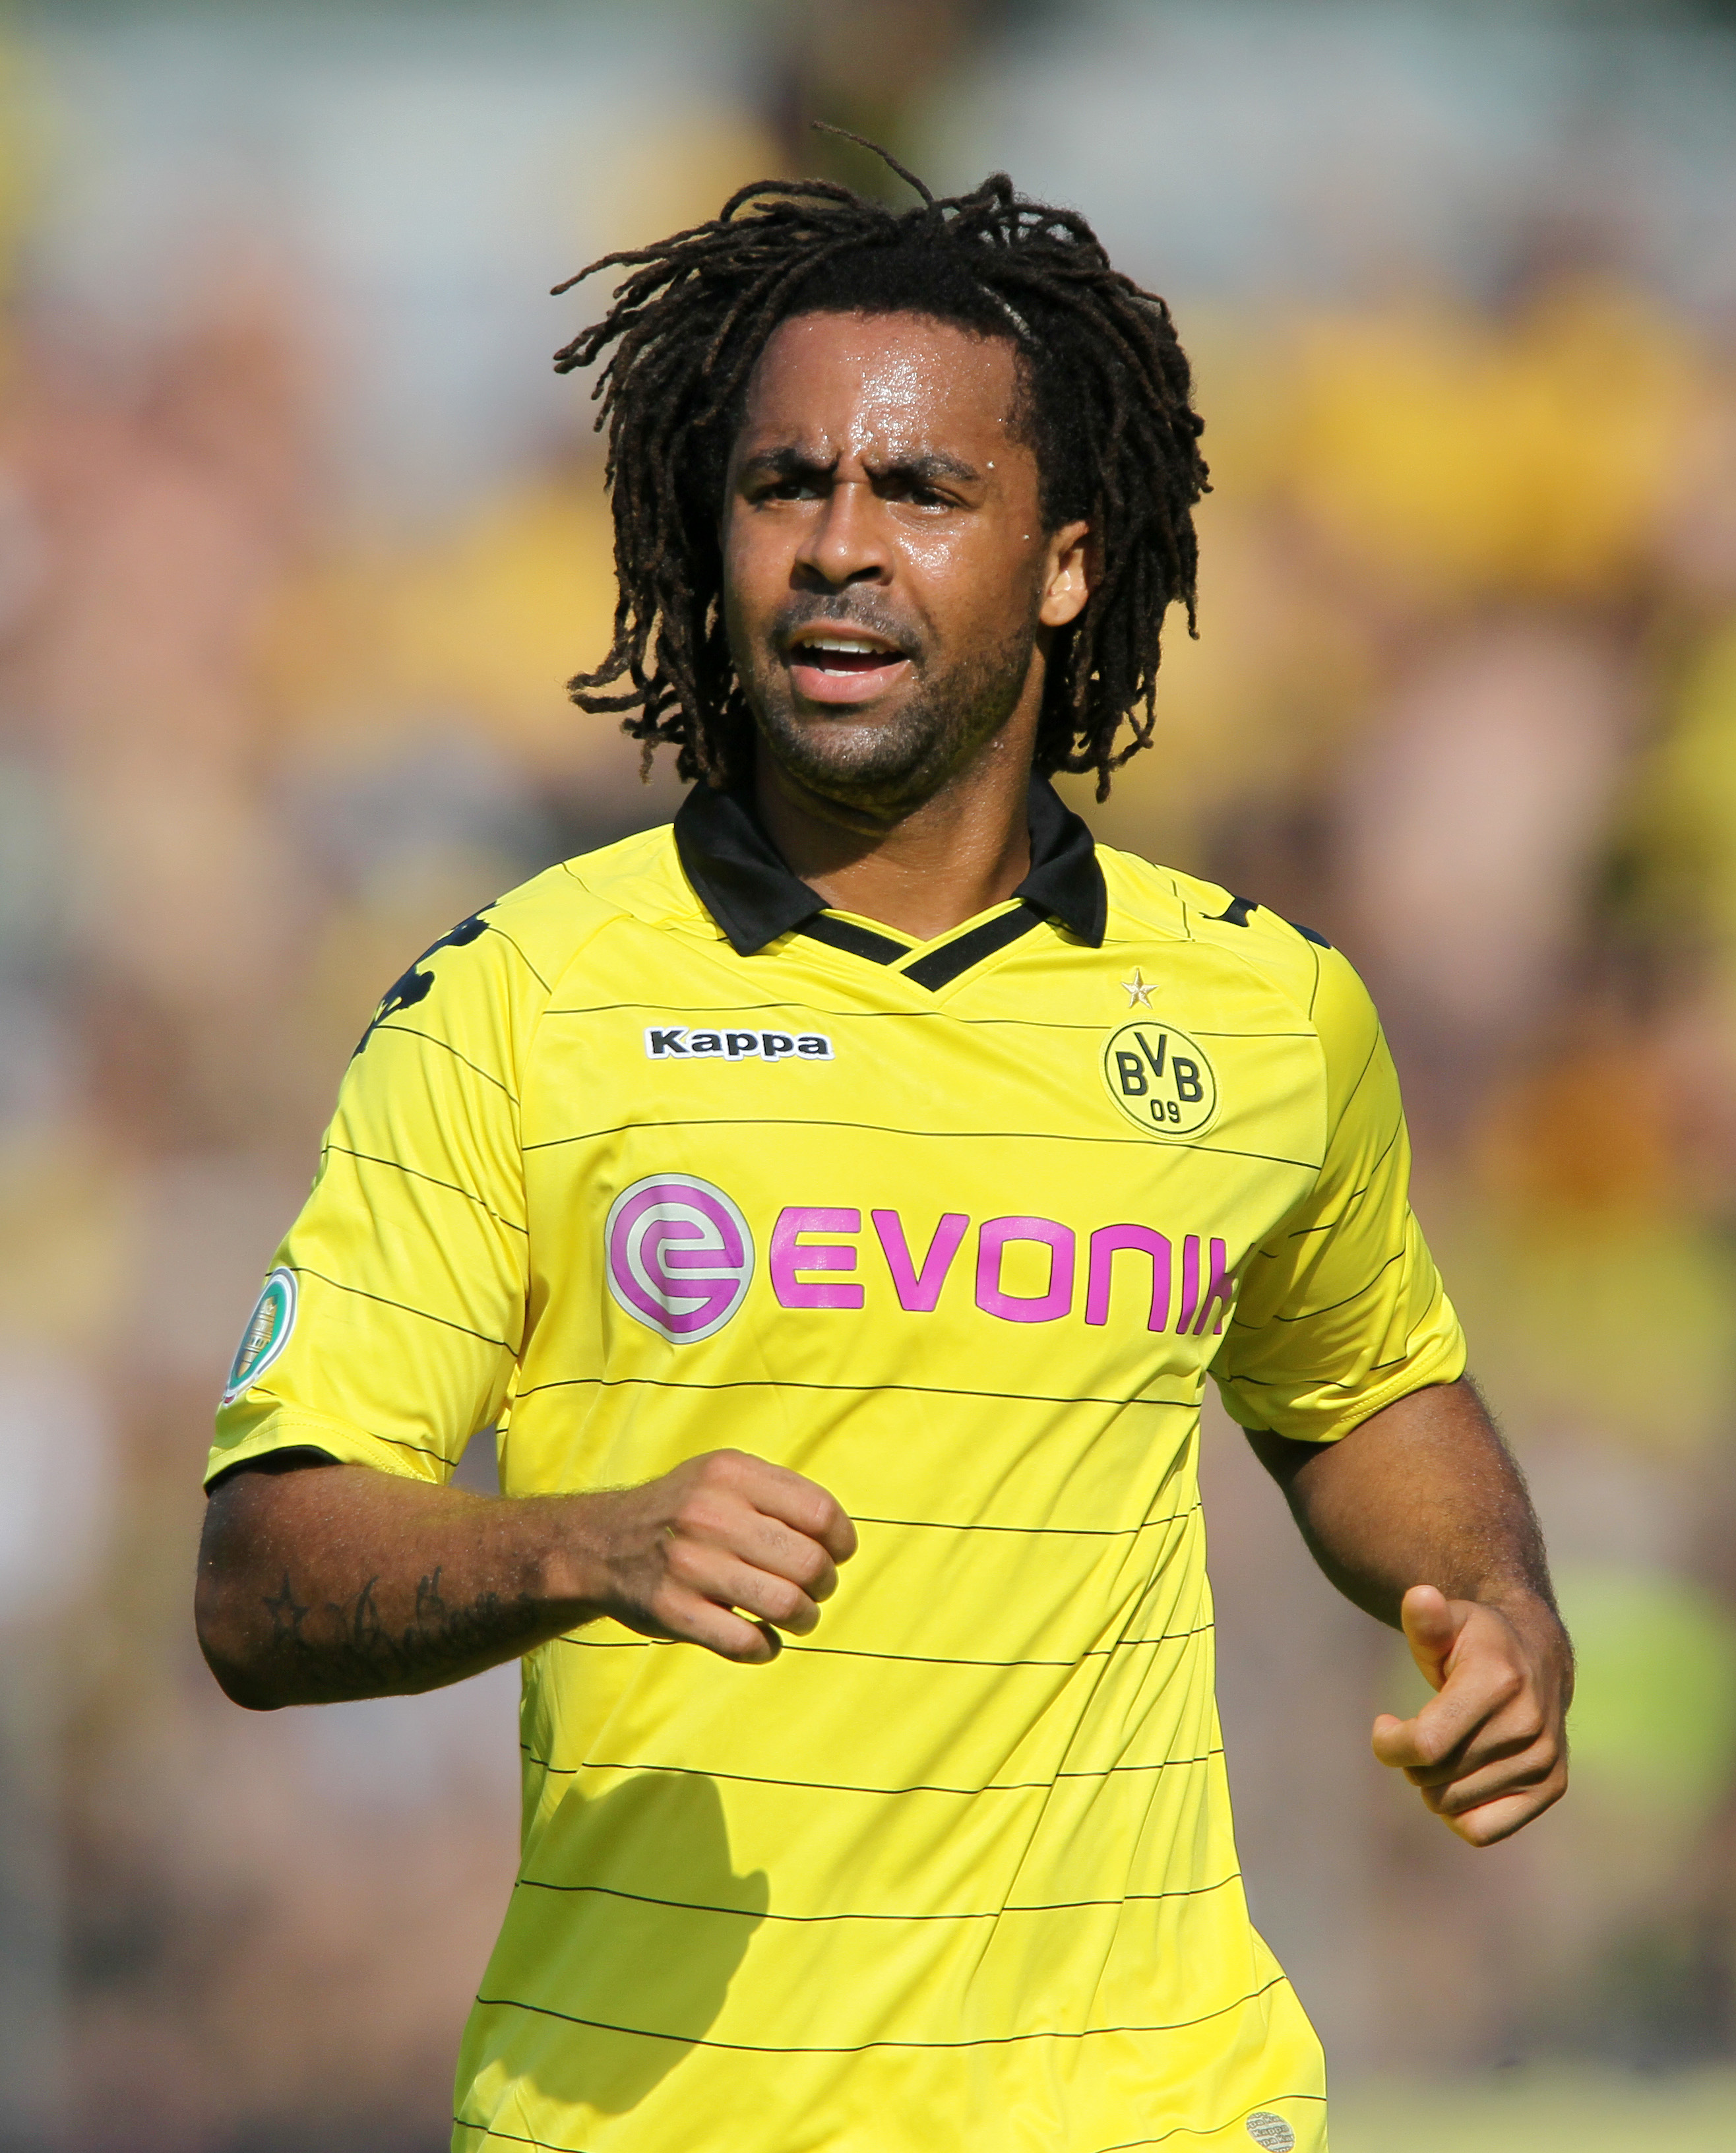 Soccer - German DFB Cup - Wacker Burghausen vs. Borussia Dortmund